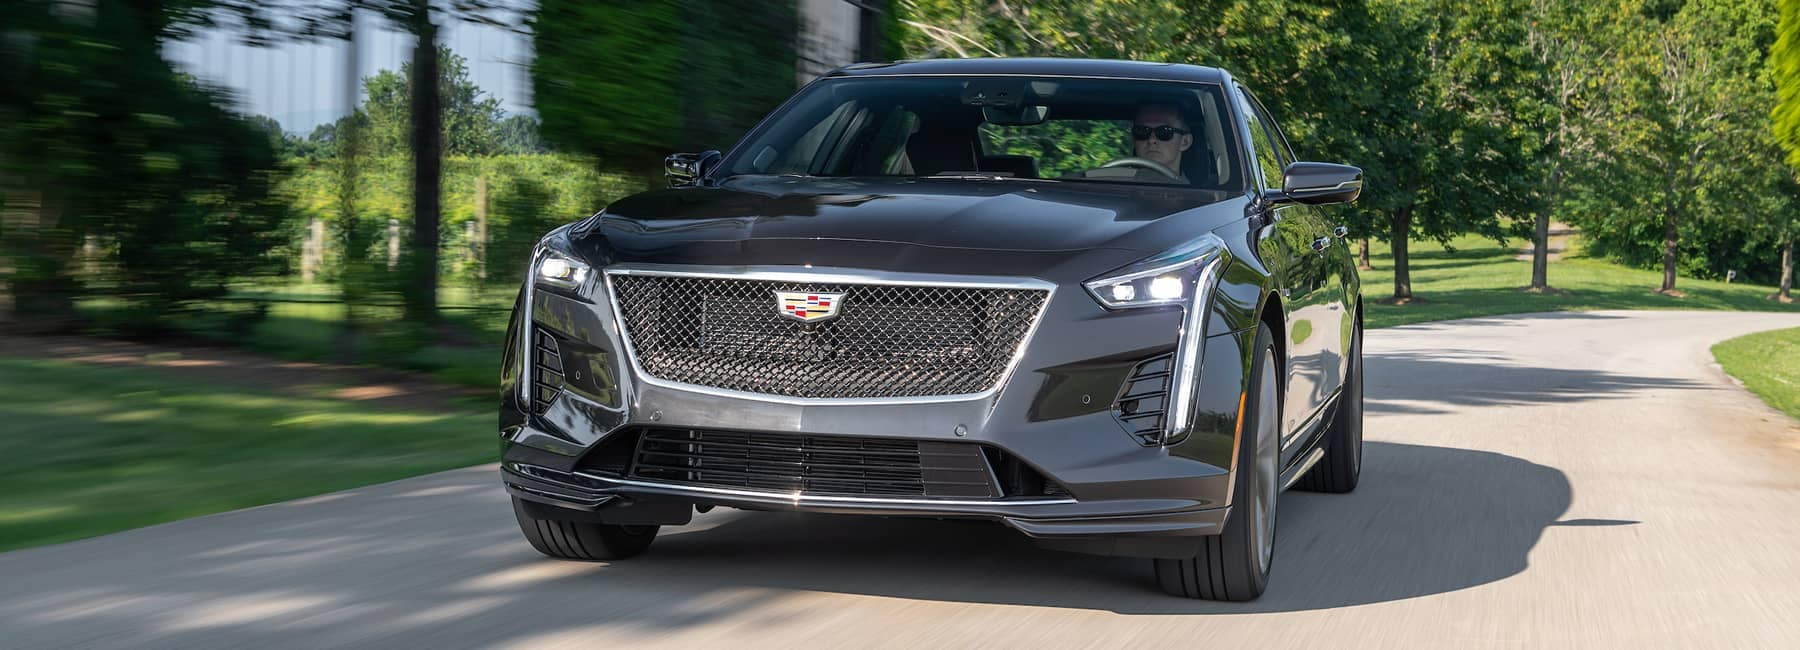 Cadillac Sedan on rural road